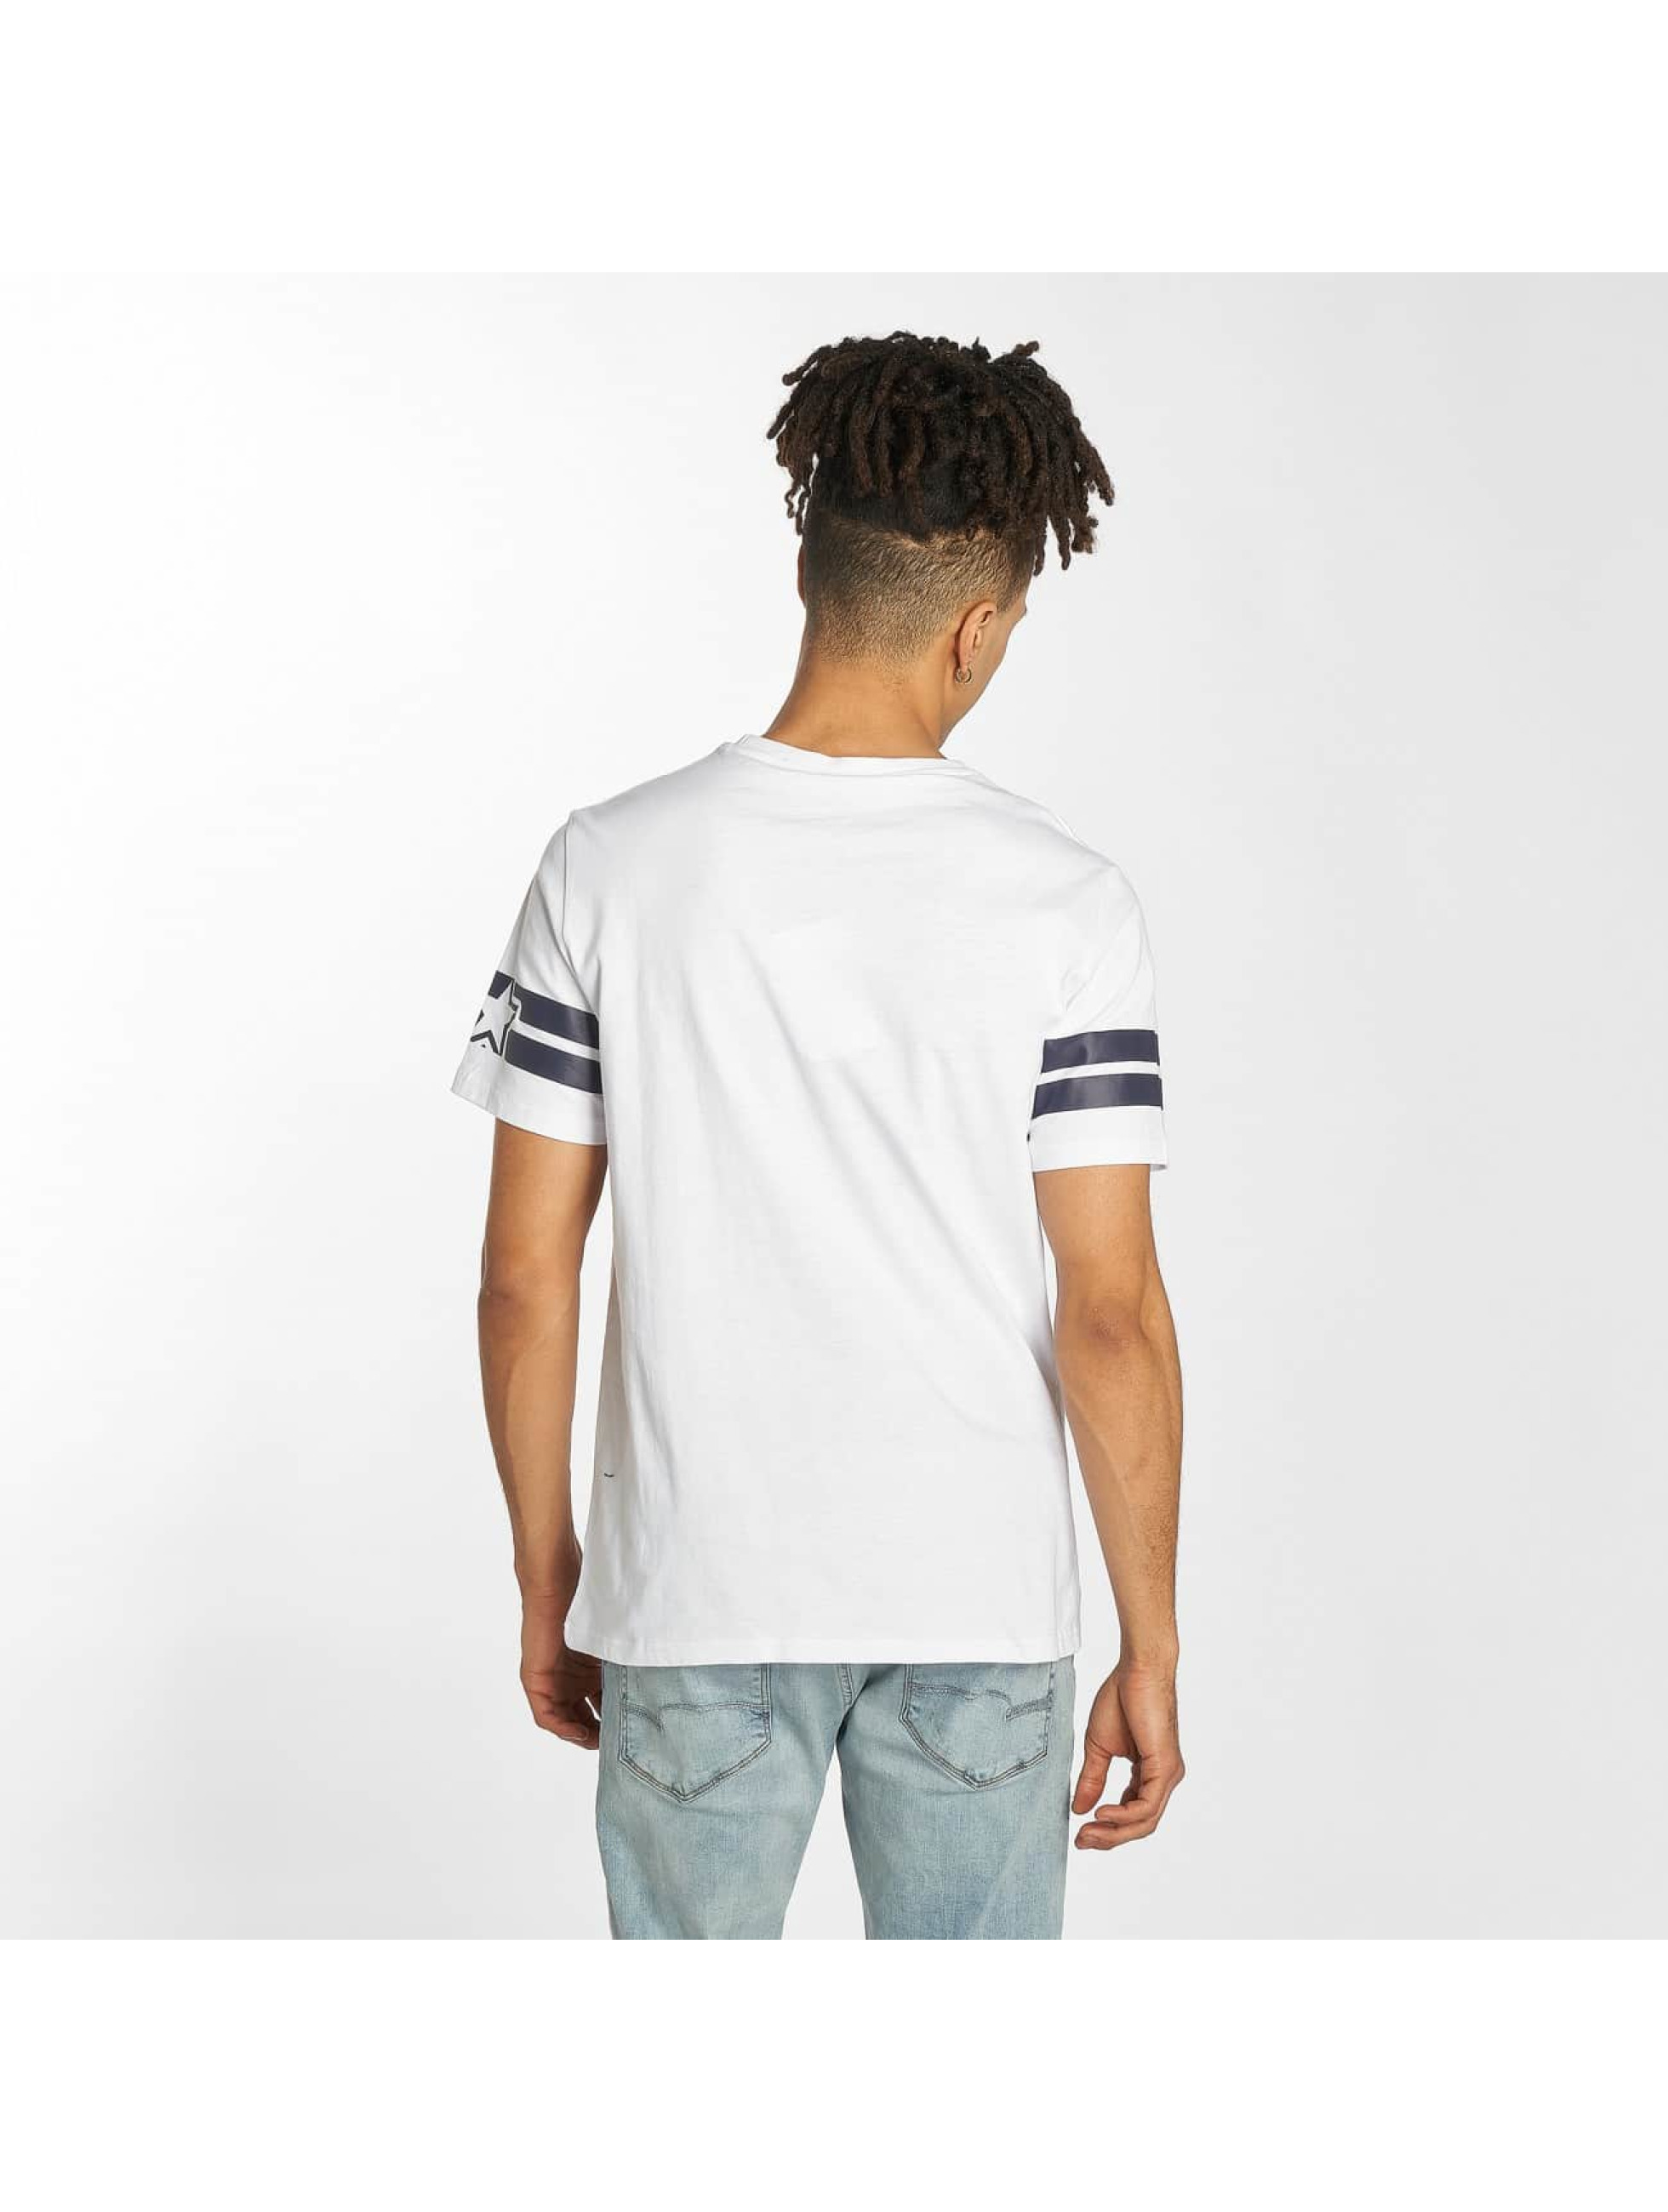 Starter t-shirt Cracraft wit